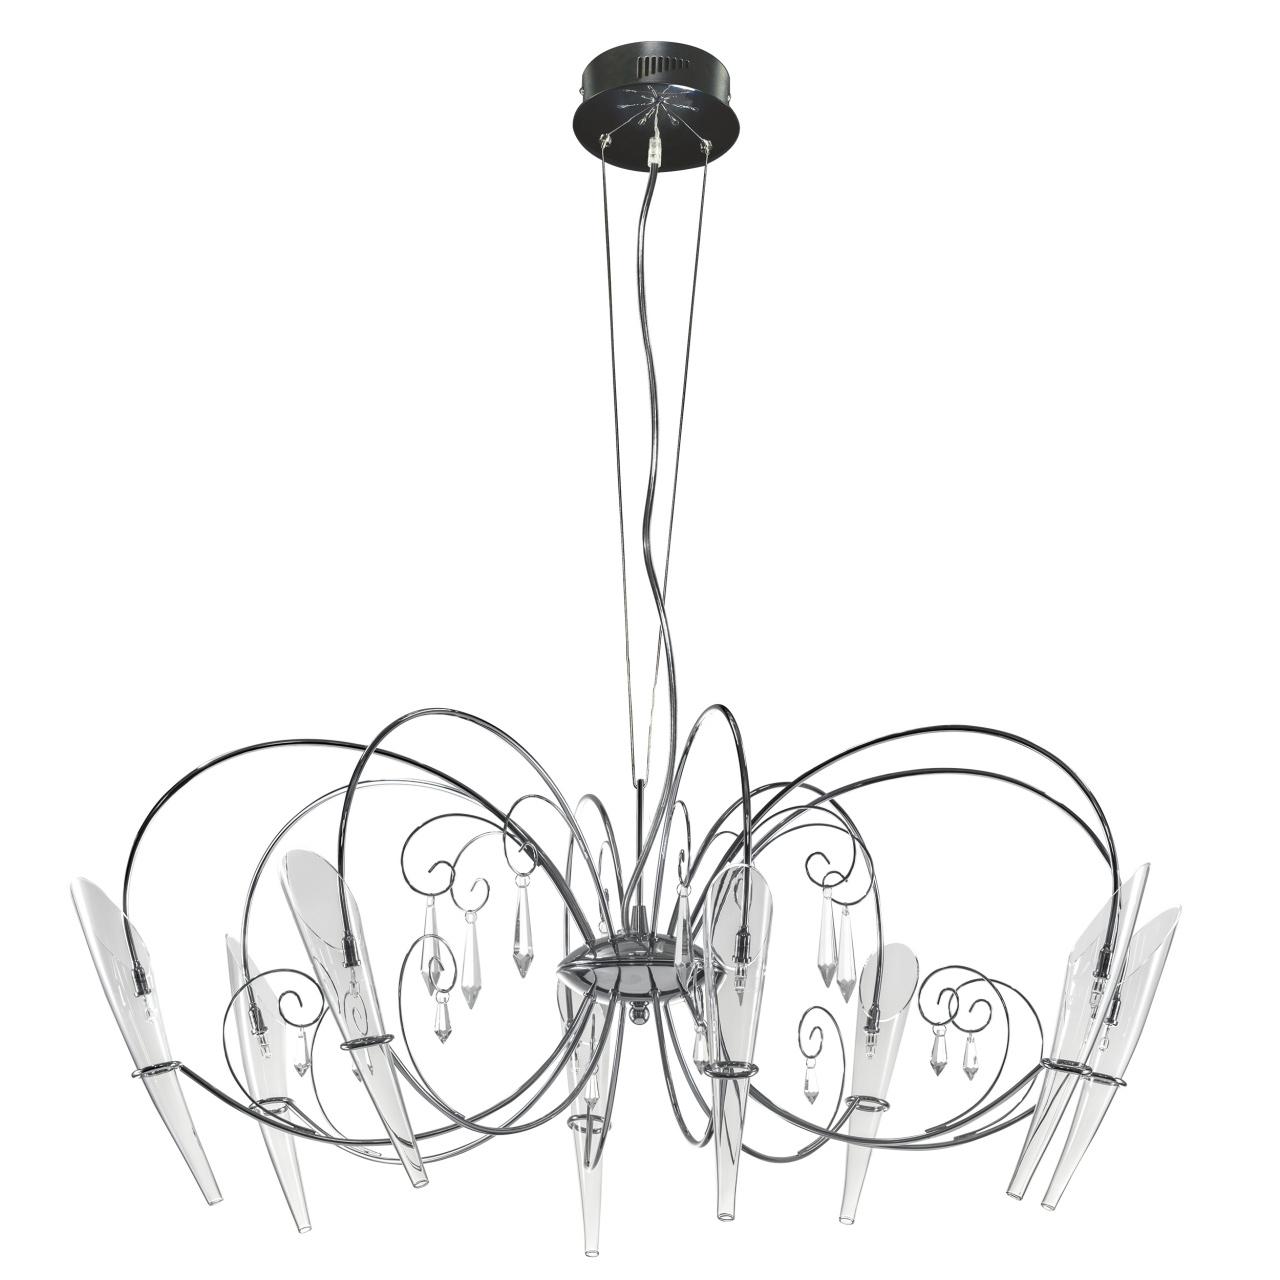 Люстра подвесная Scarabeo 8х35W G4 12V хром хрусталь / стекло Lightstar 755084